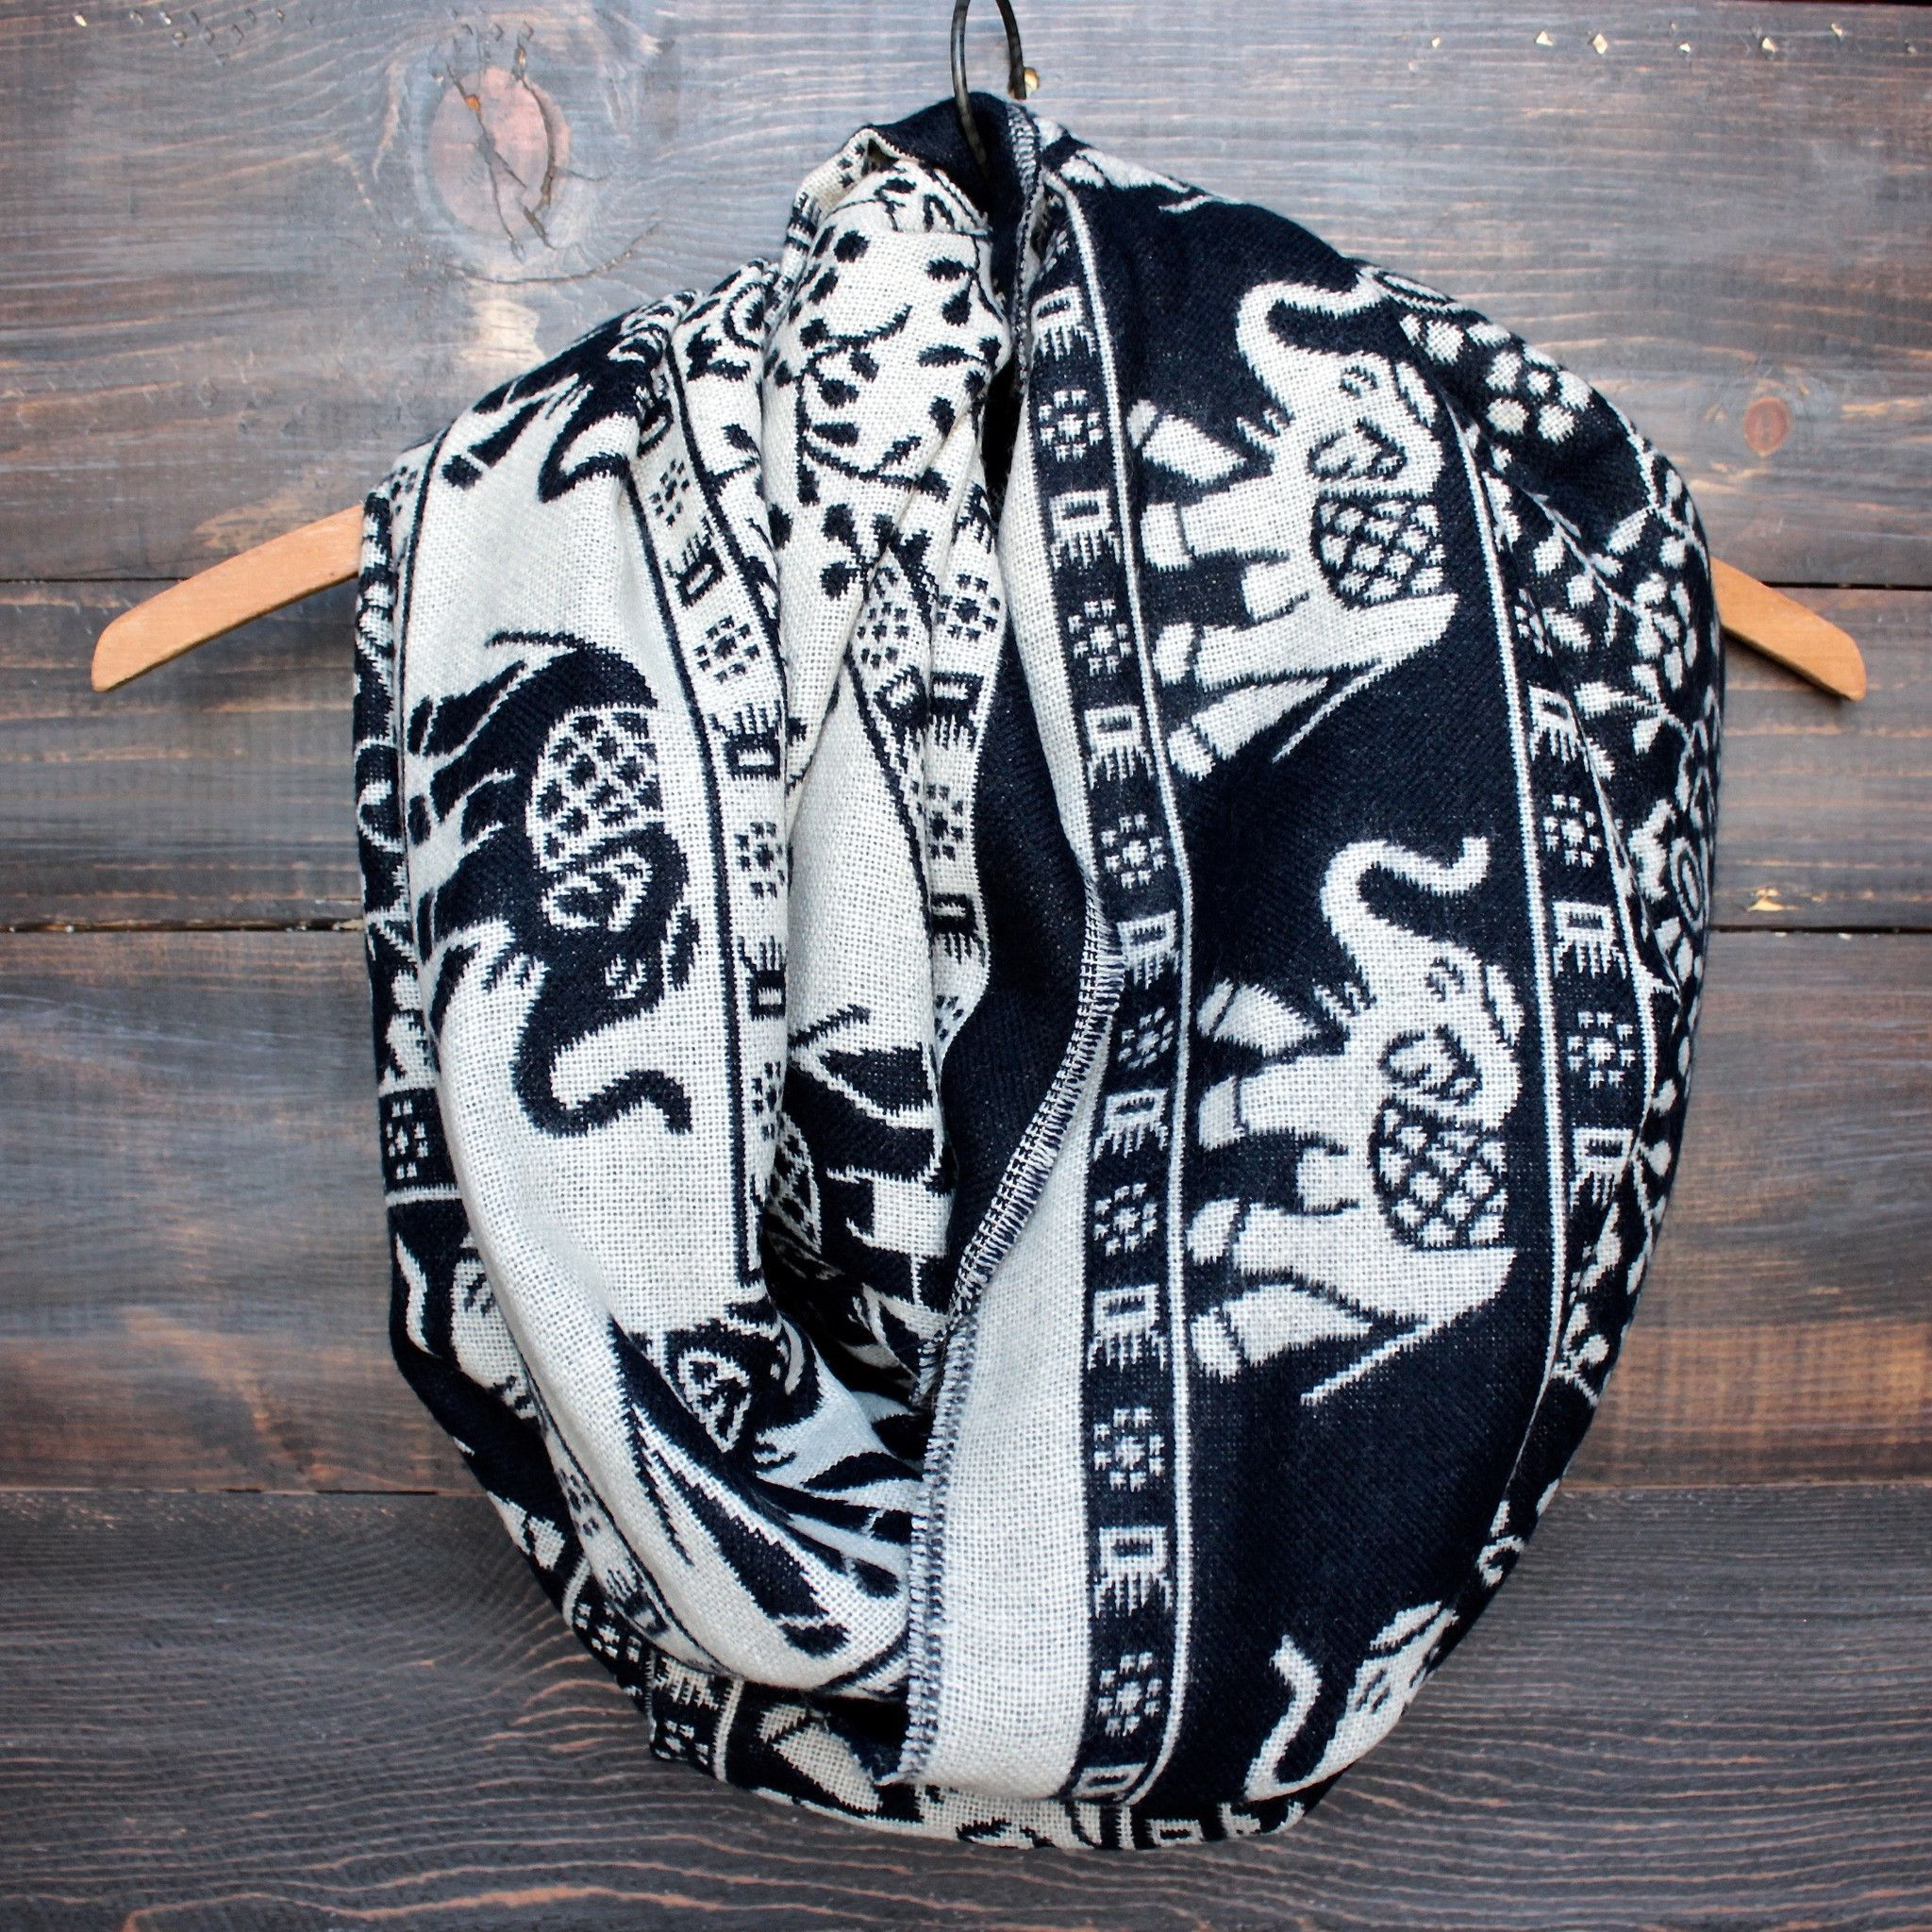 Geronimo Knitting Bali : Bali elephant print reversible knit scarf more colors